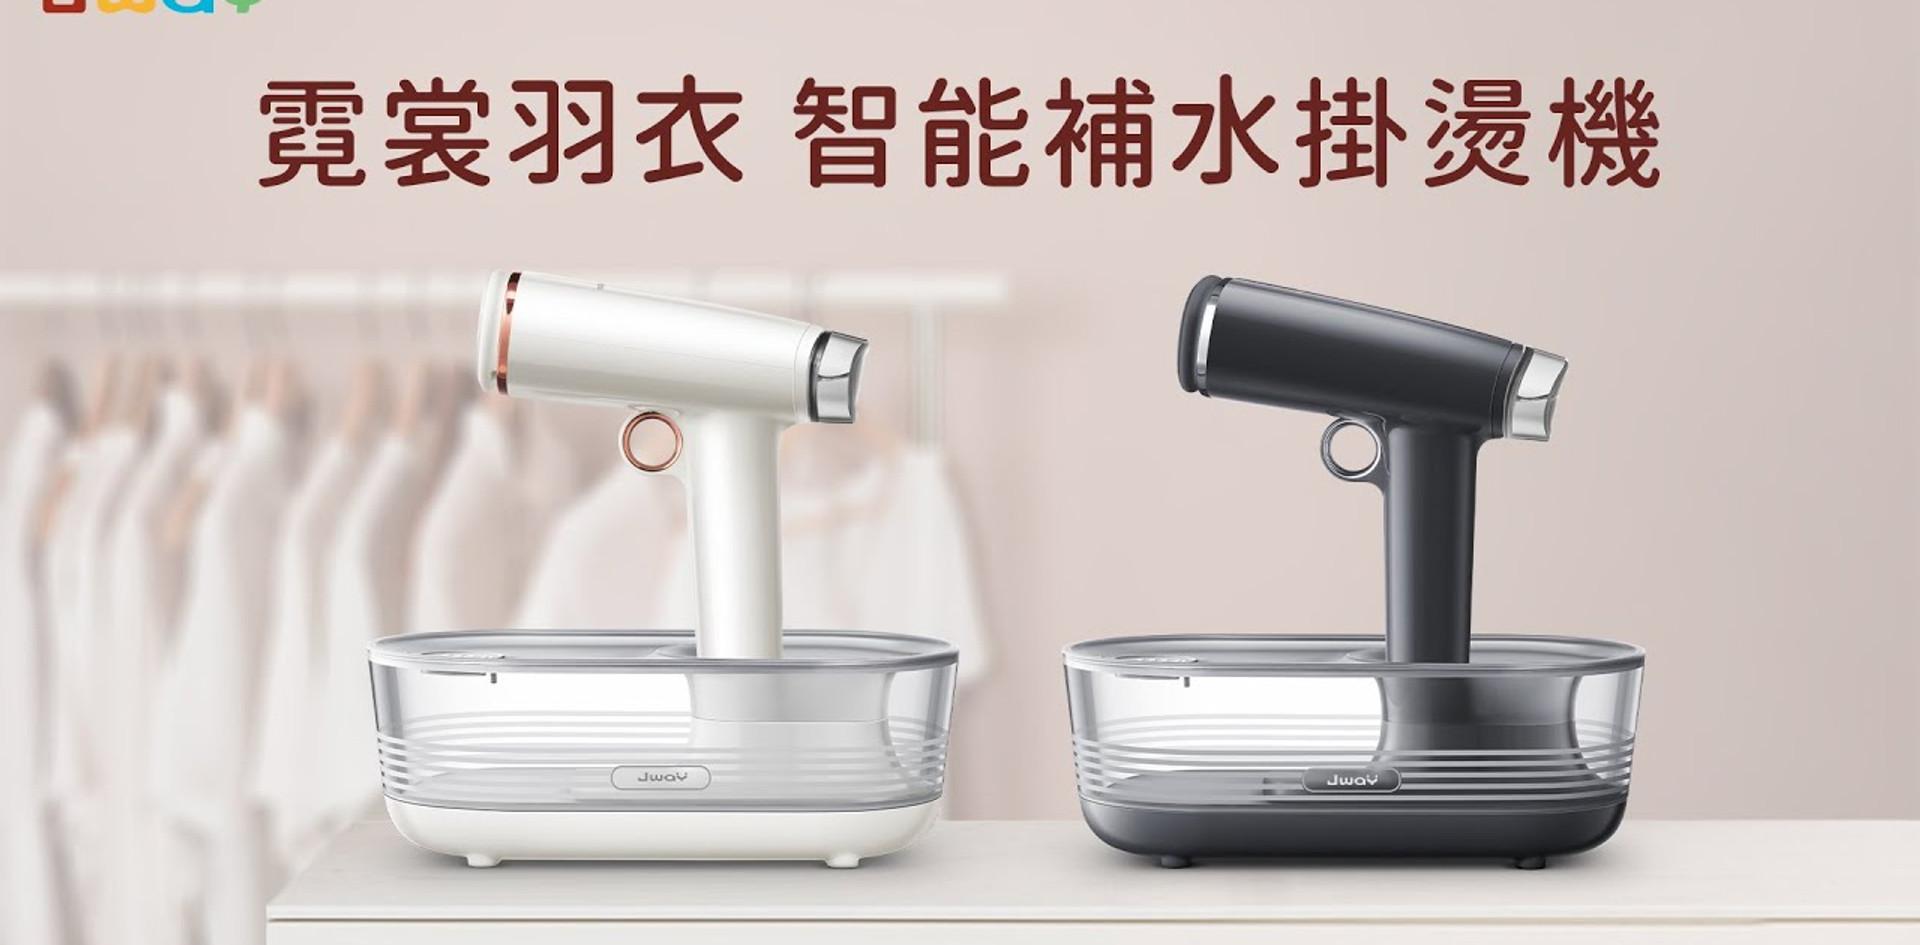 【JWAY】霓裳羽衣 智能補水掛燙機